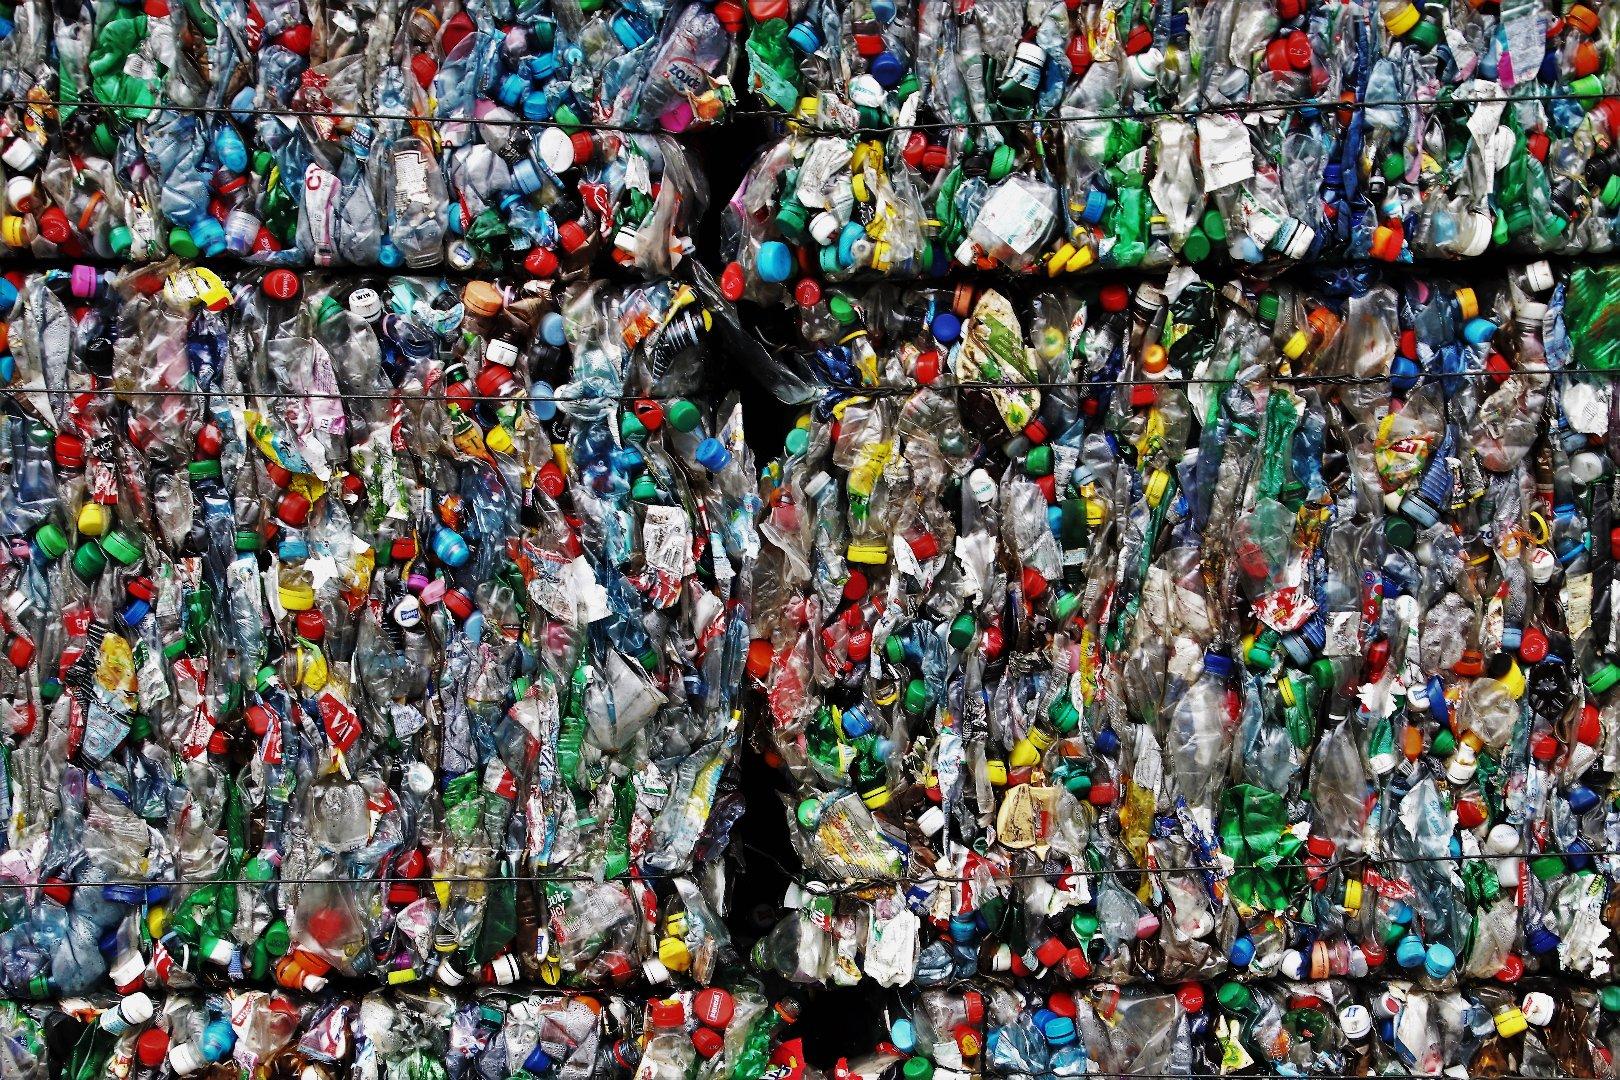 plastic-3491137.jpg